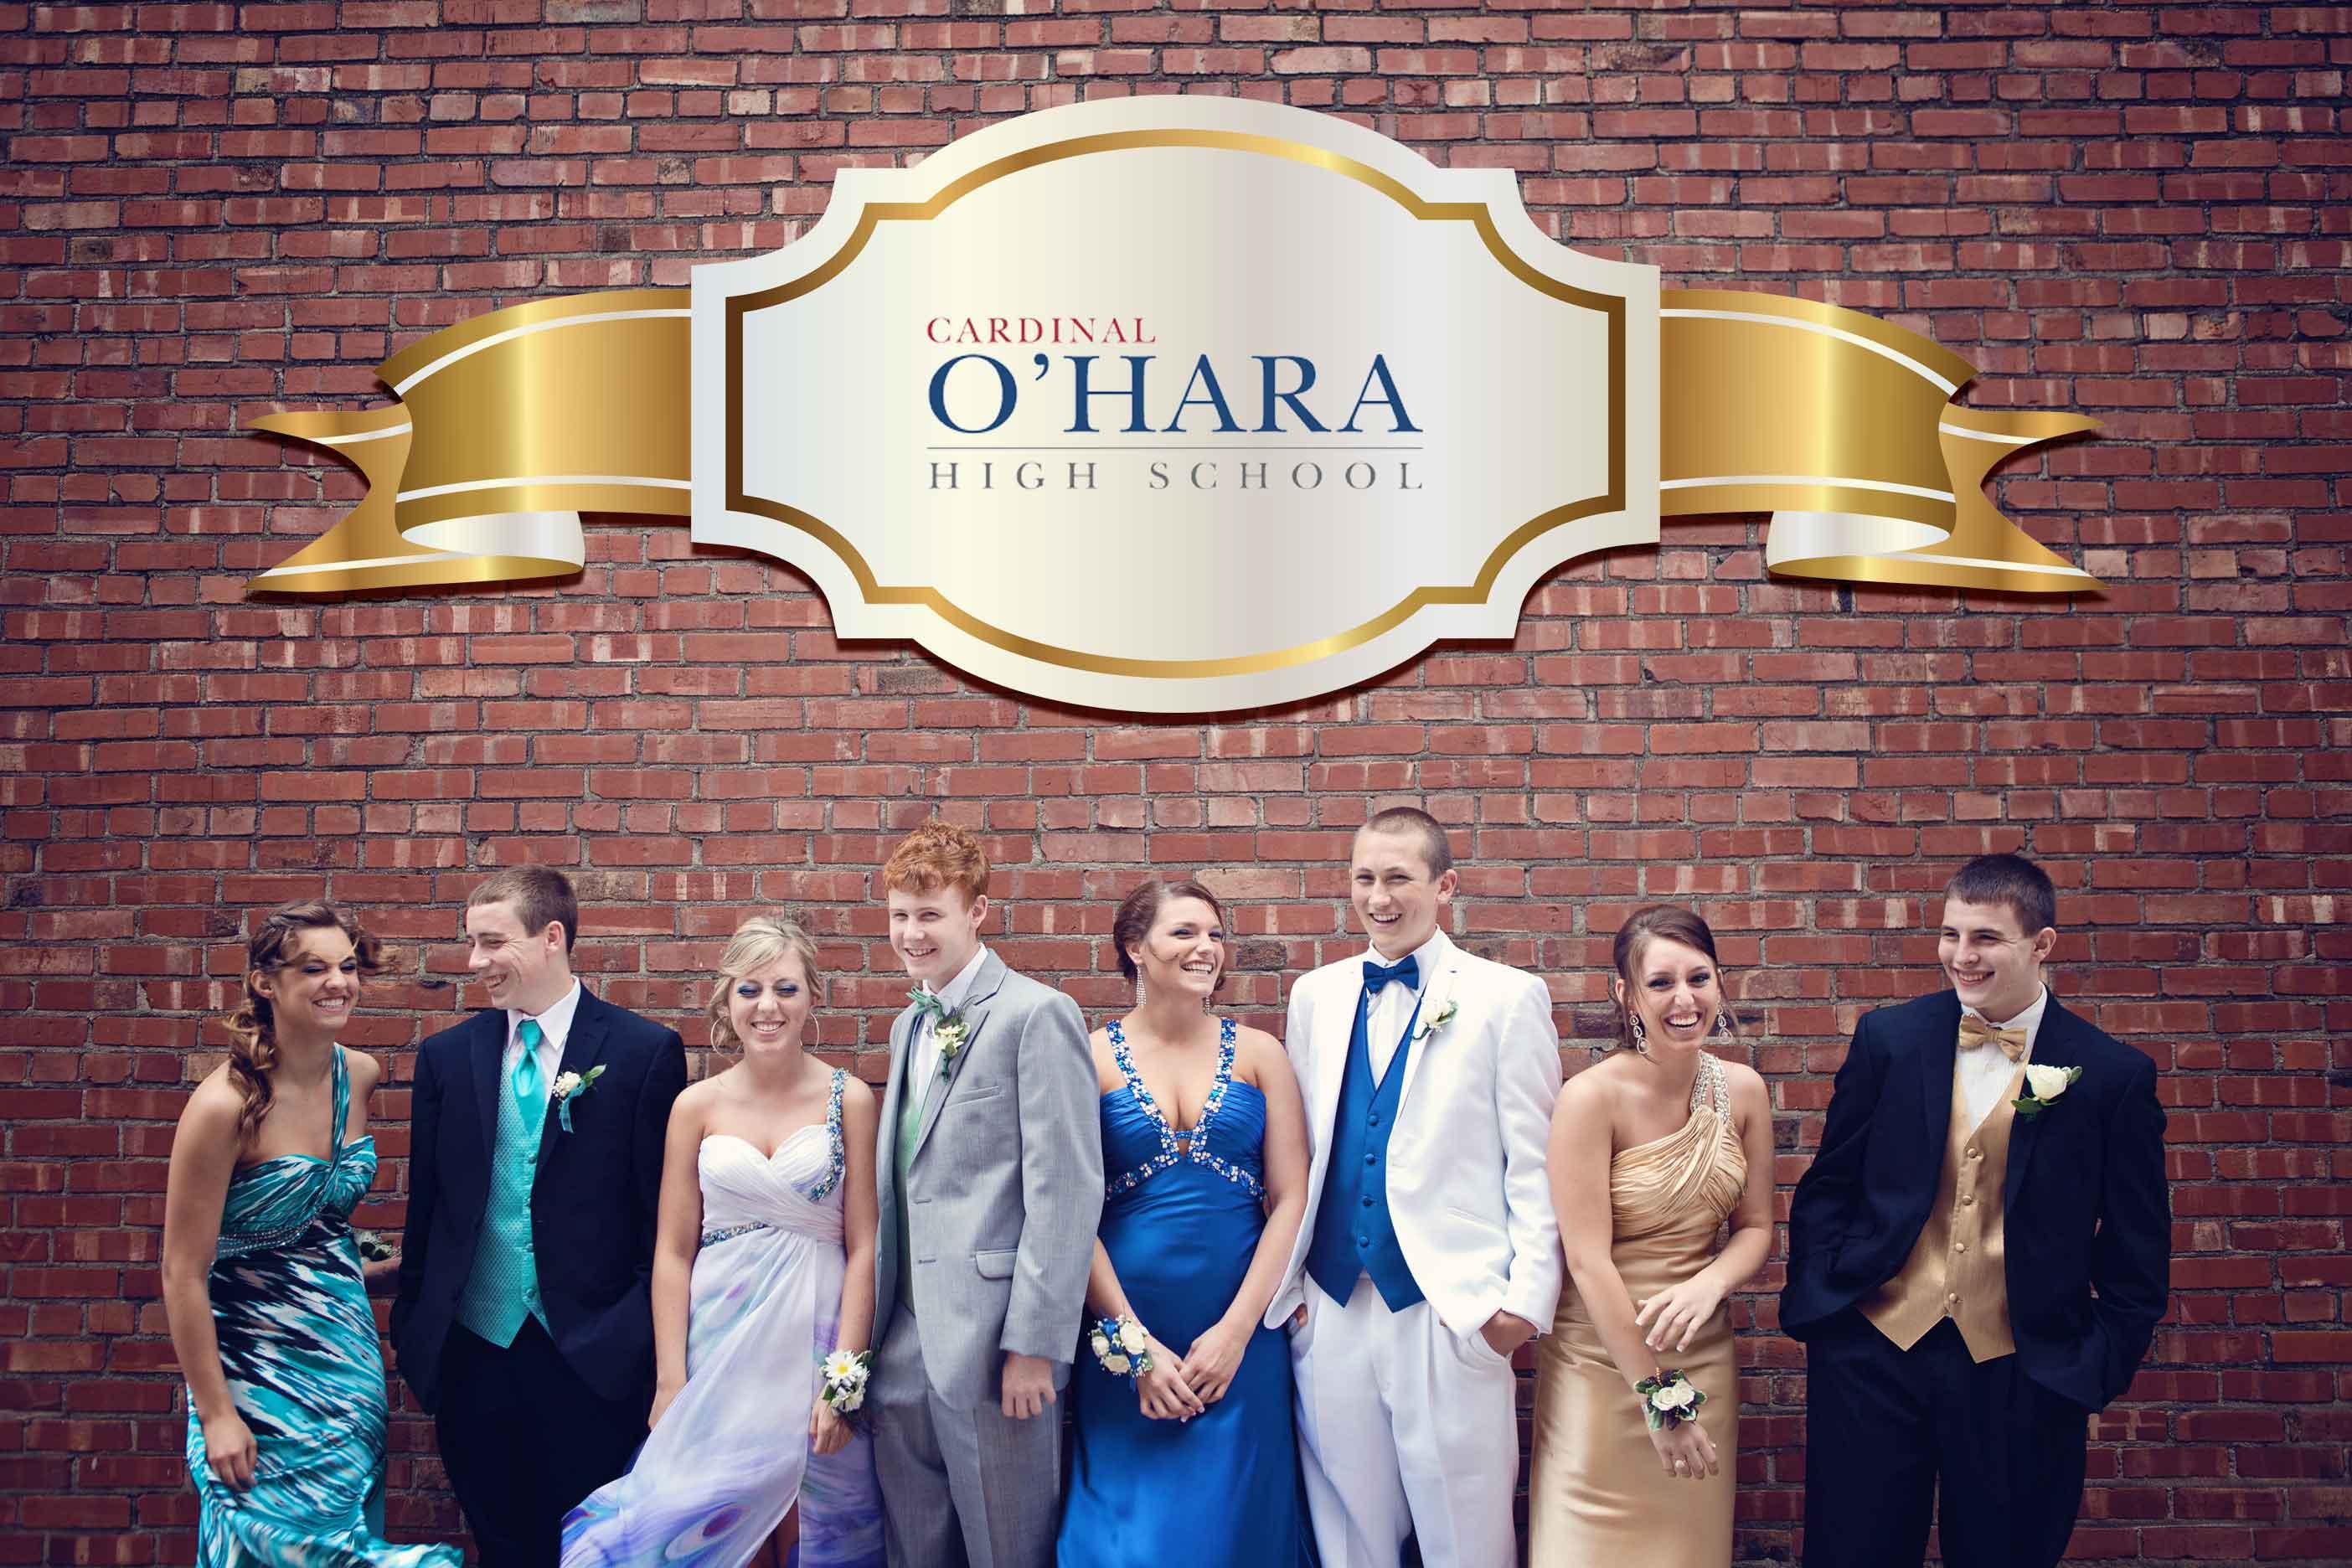 cardinal o'hara high school prom